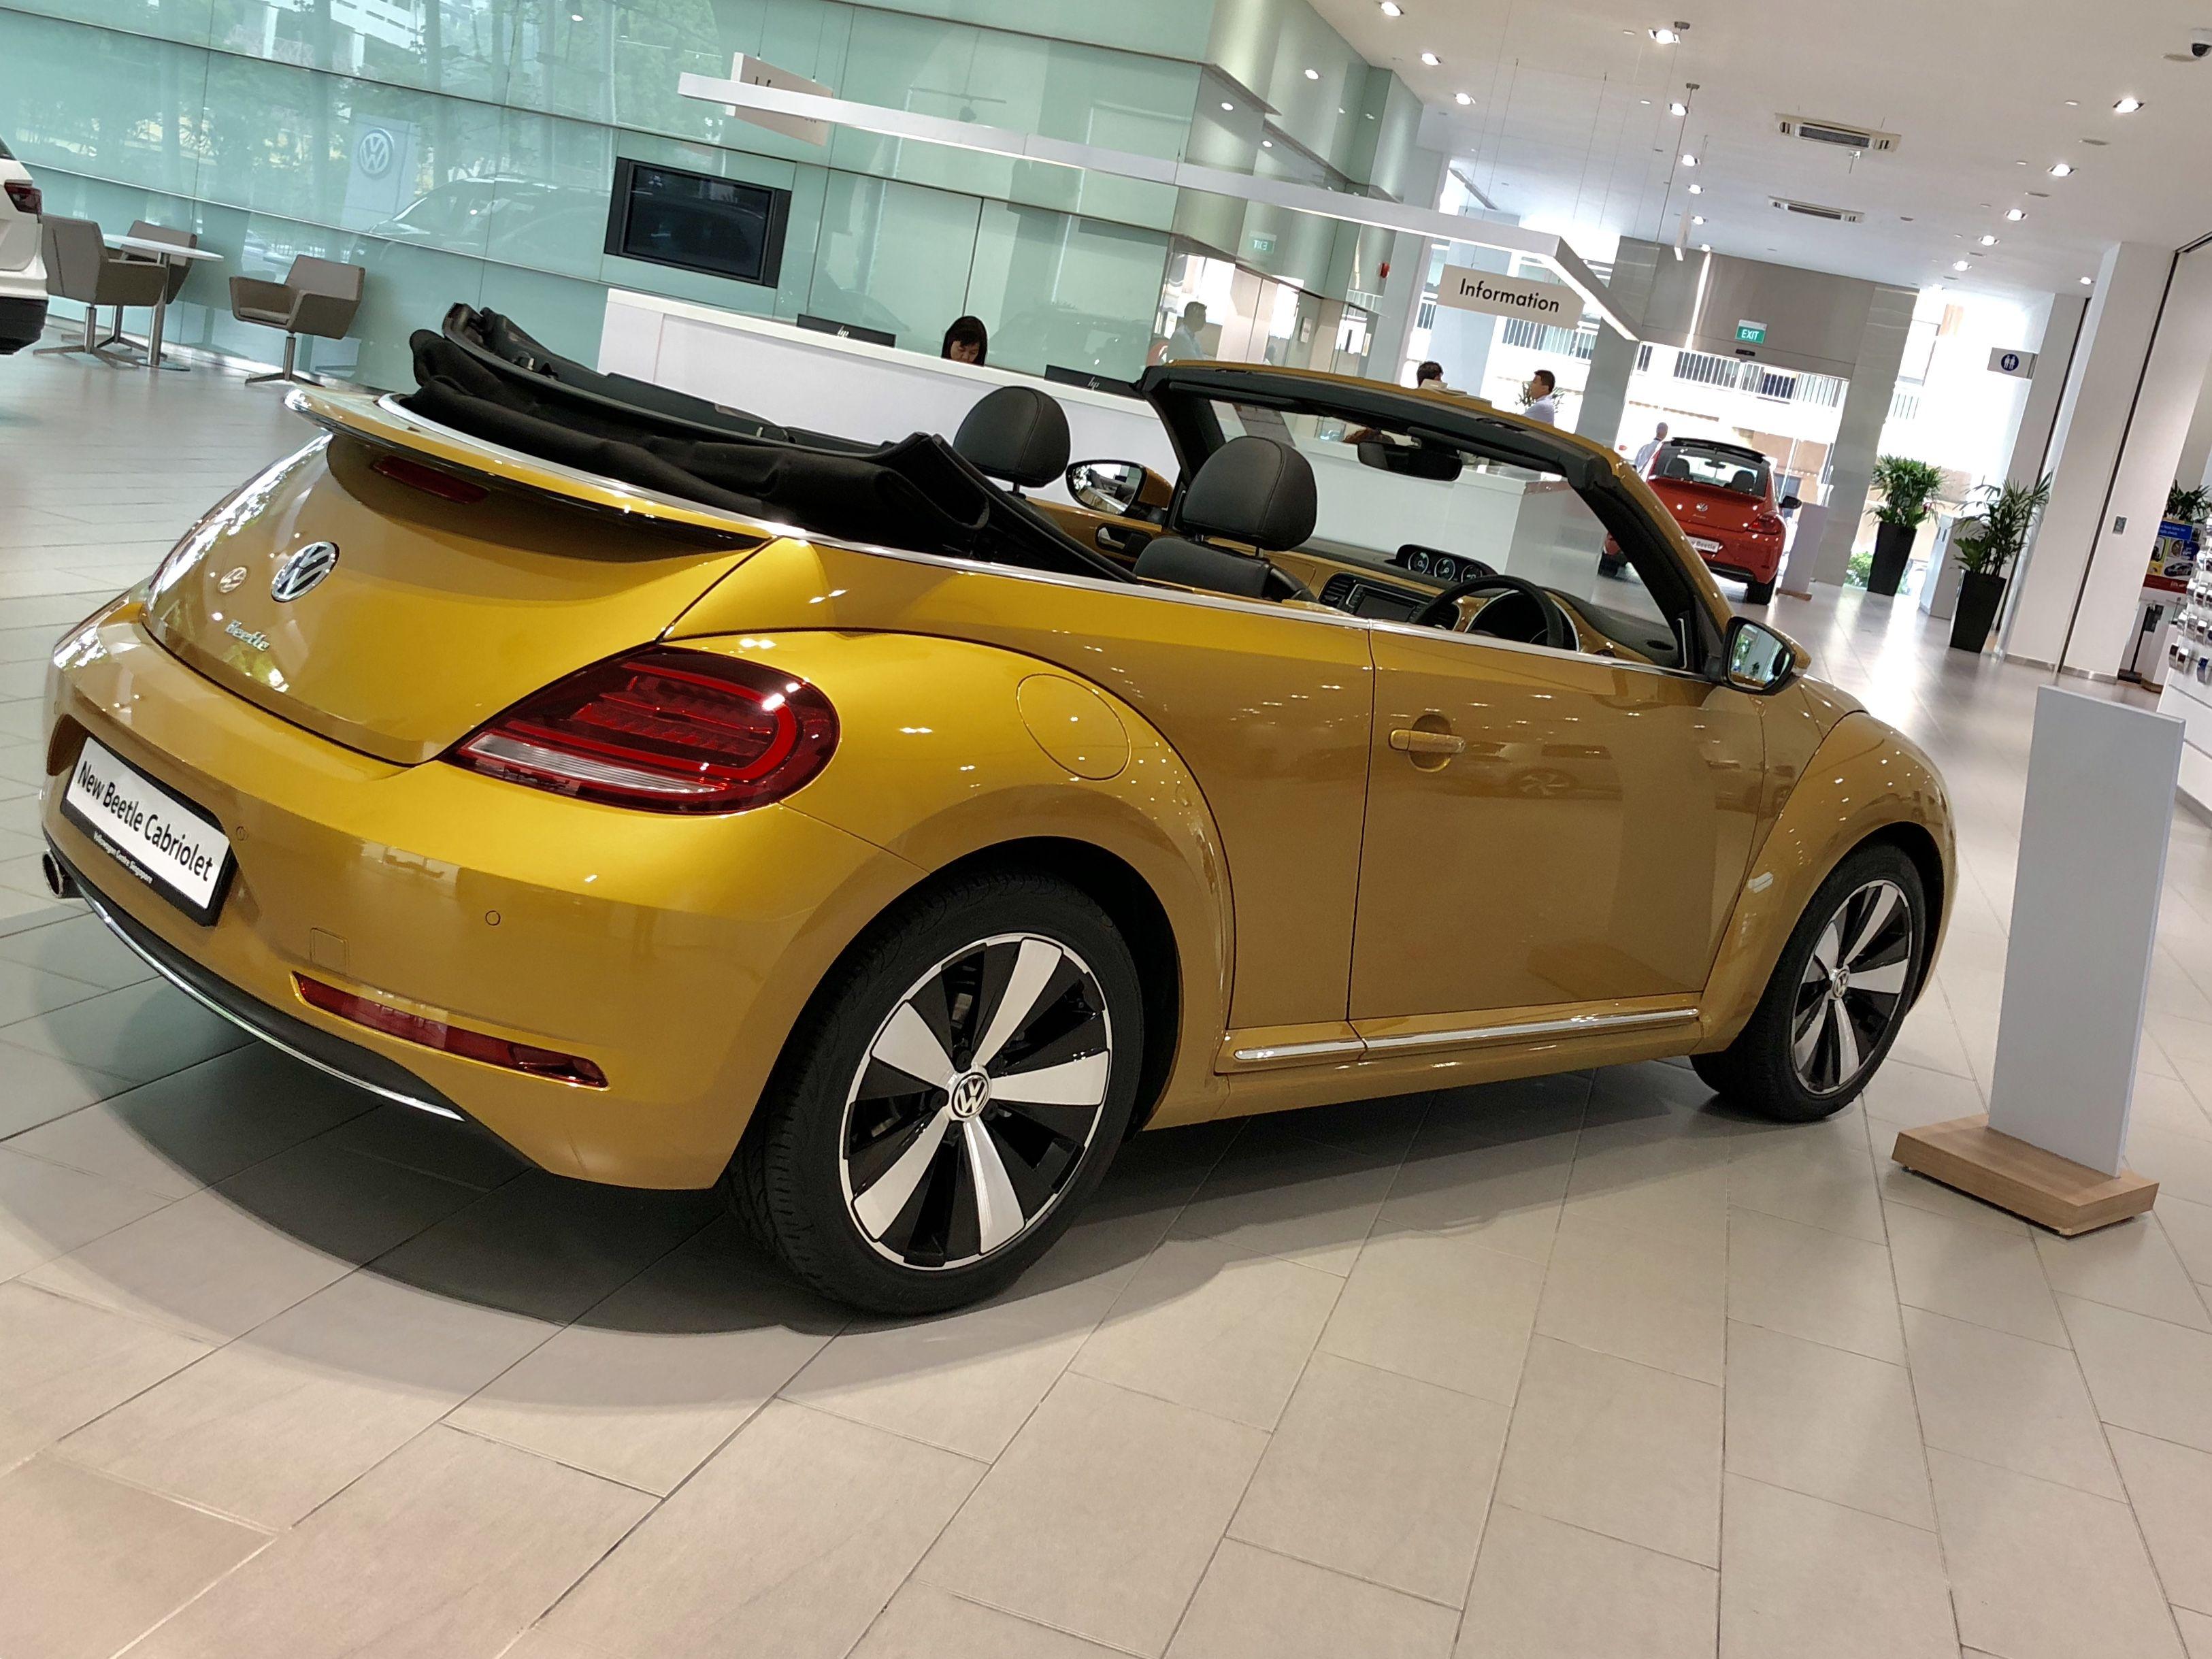 2018 VW Beetle Cabriolet